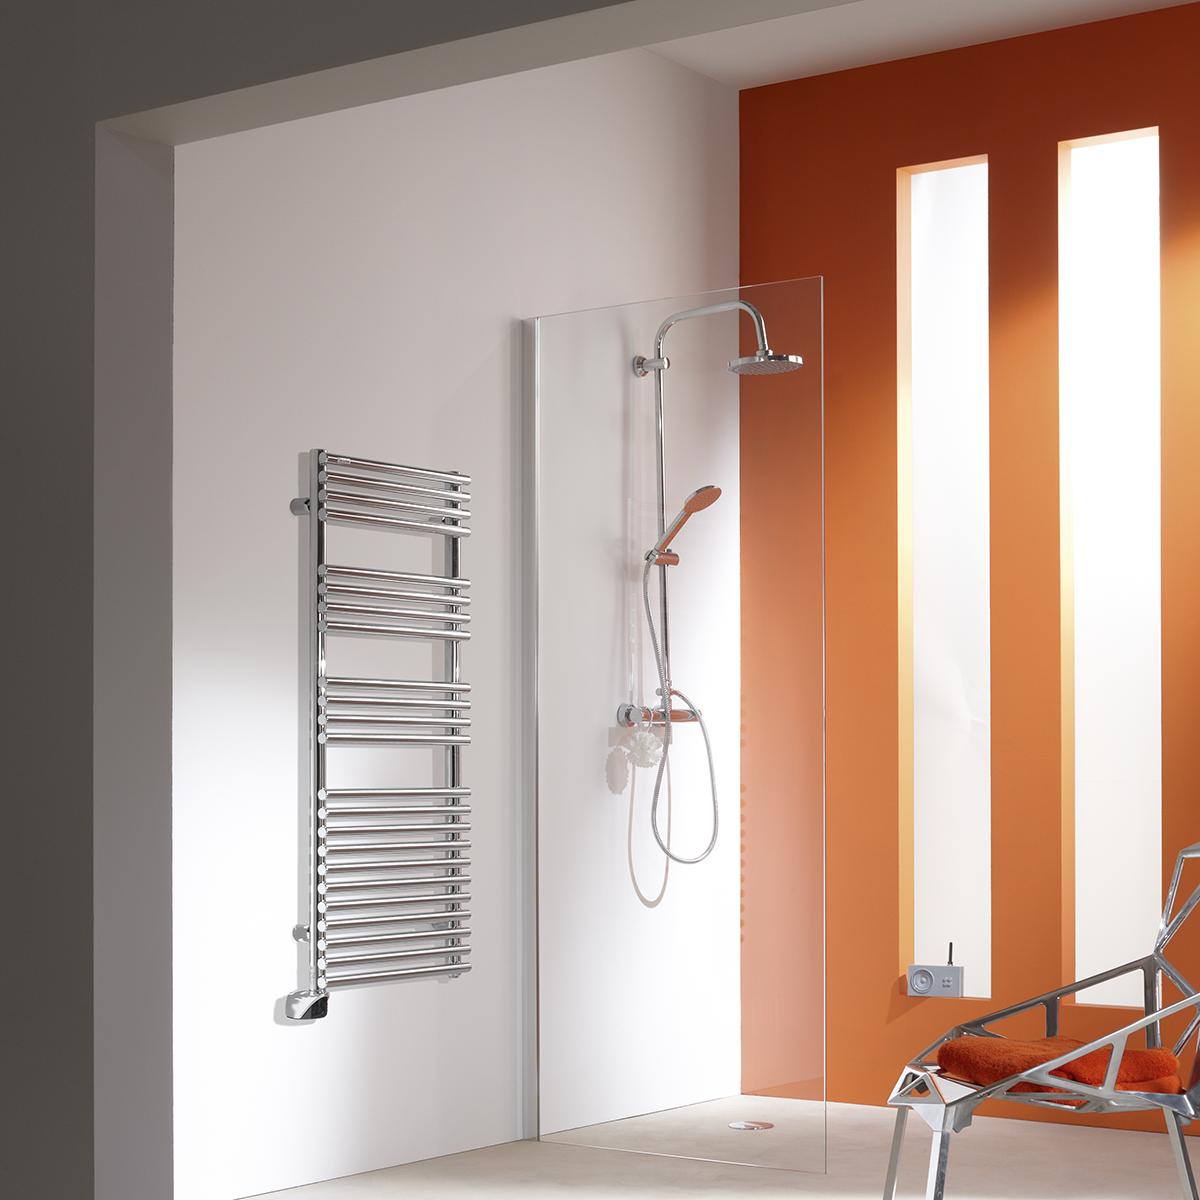 cala electrique chrome s che serviettes chauffage. Black Bedroom Furniture Sets. Home Design Ideas